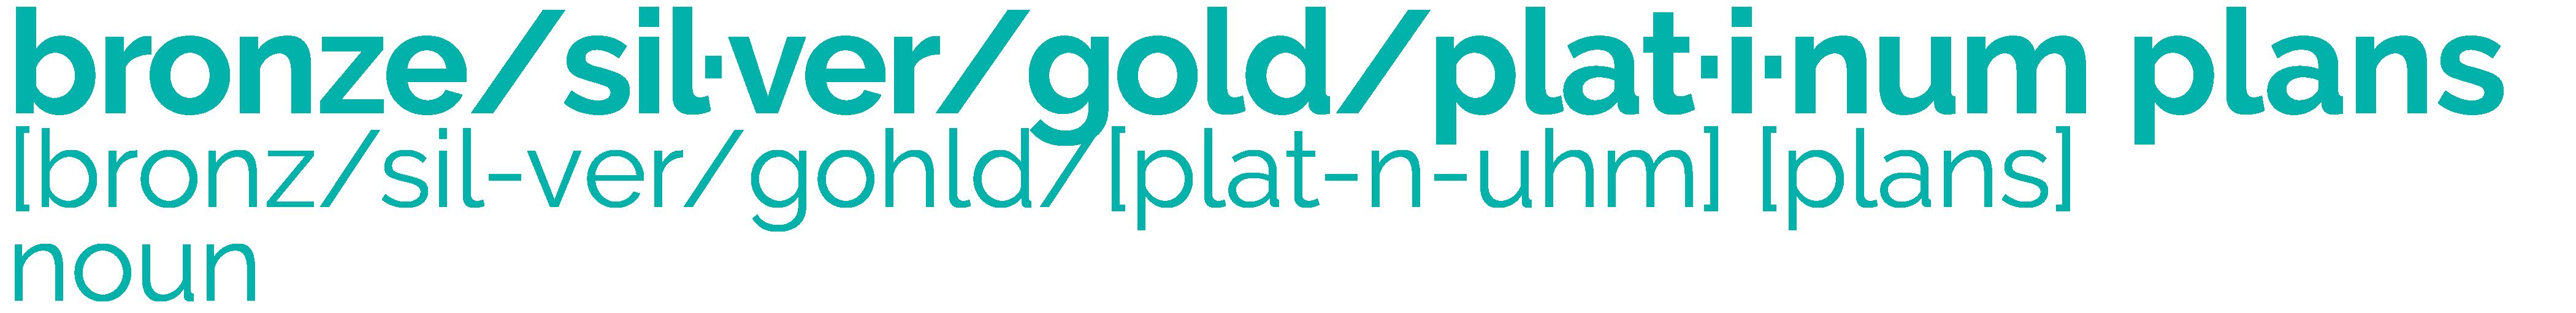 Bronze Silver Platinum plans